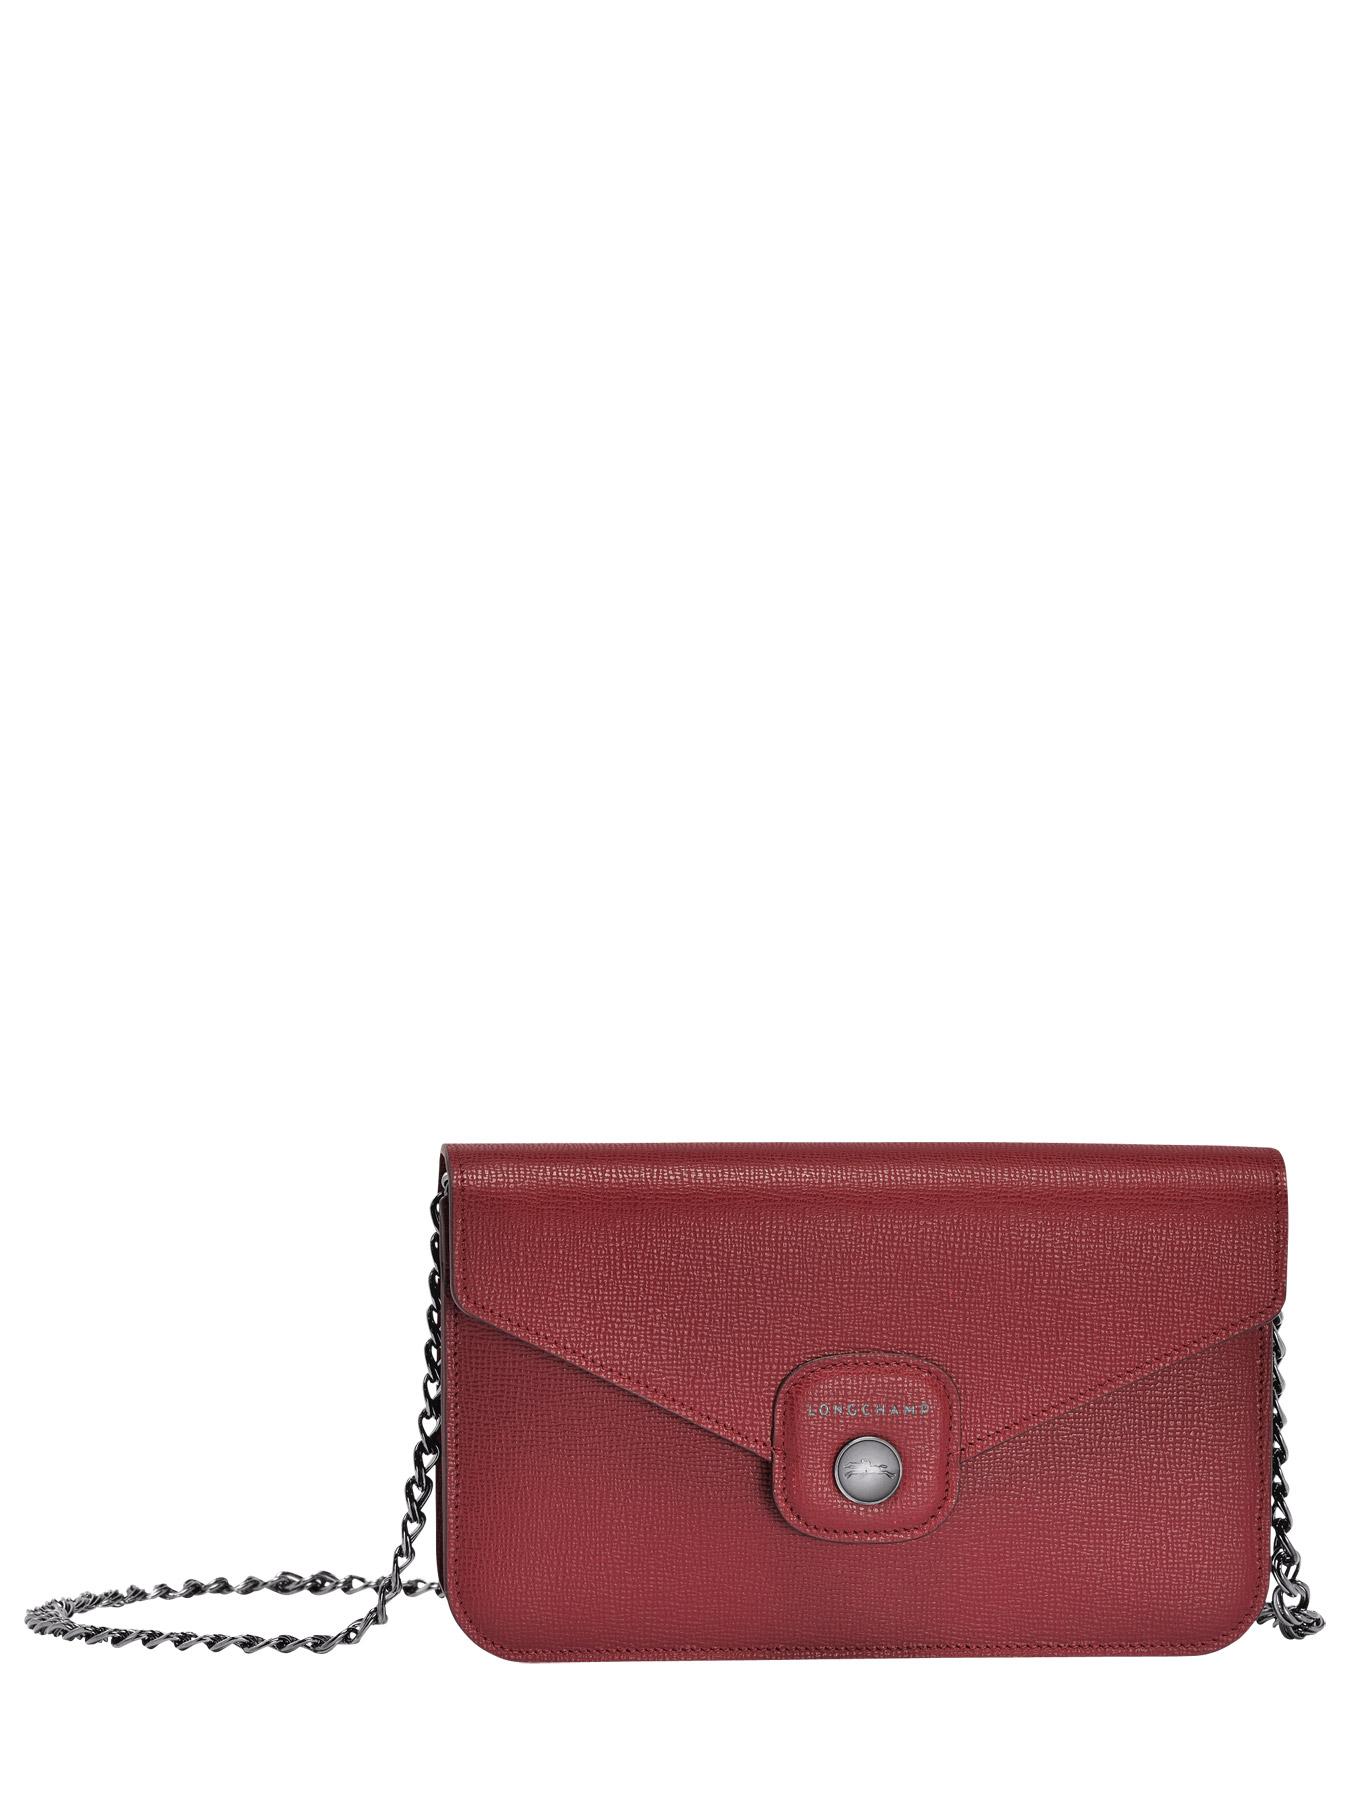 0eada31159 Longchamp Wallet 4559813 - free shipping available